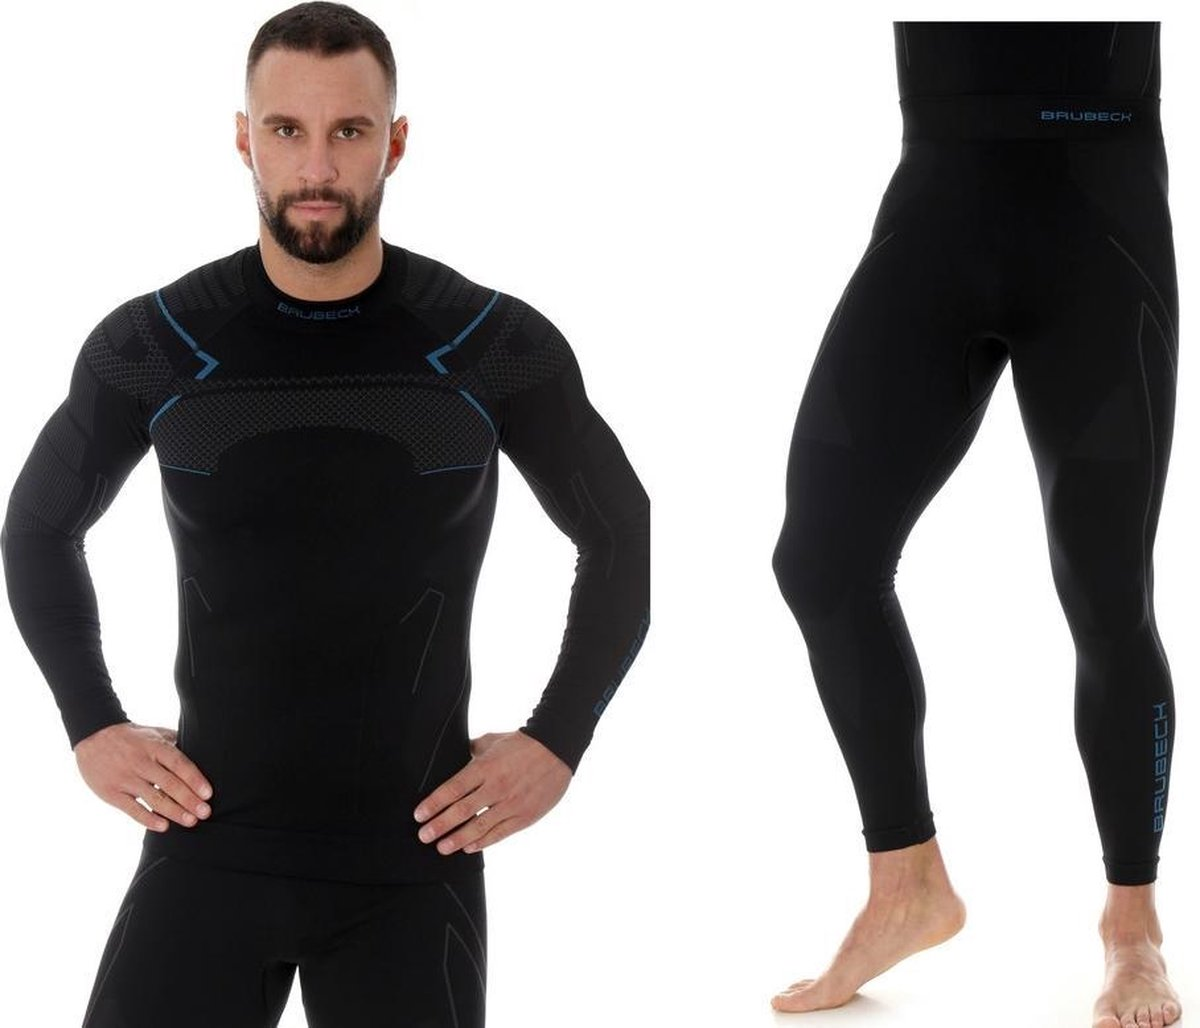 Brubeck Heren Thermokleding Set - met Nilit® Heat - Zwart/Blauw - XL